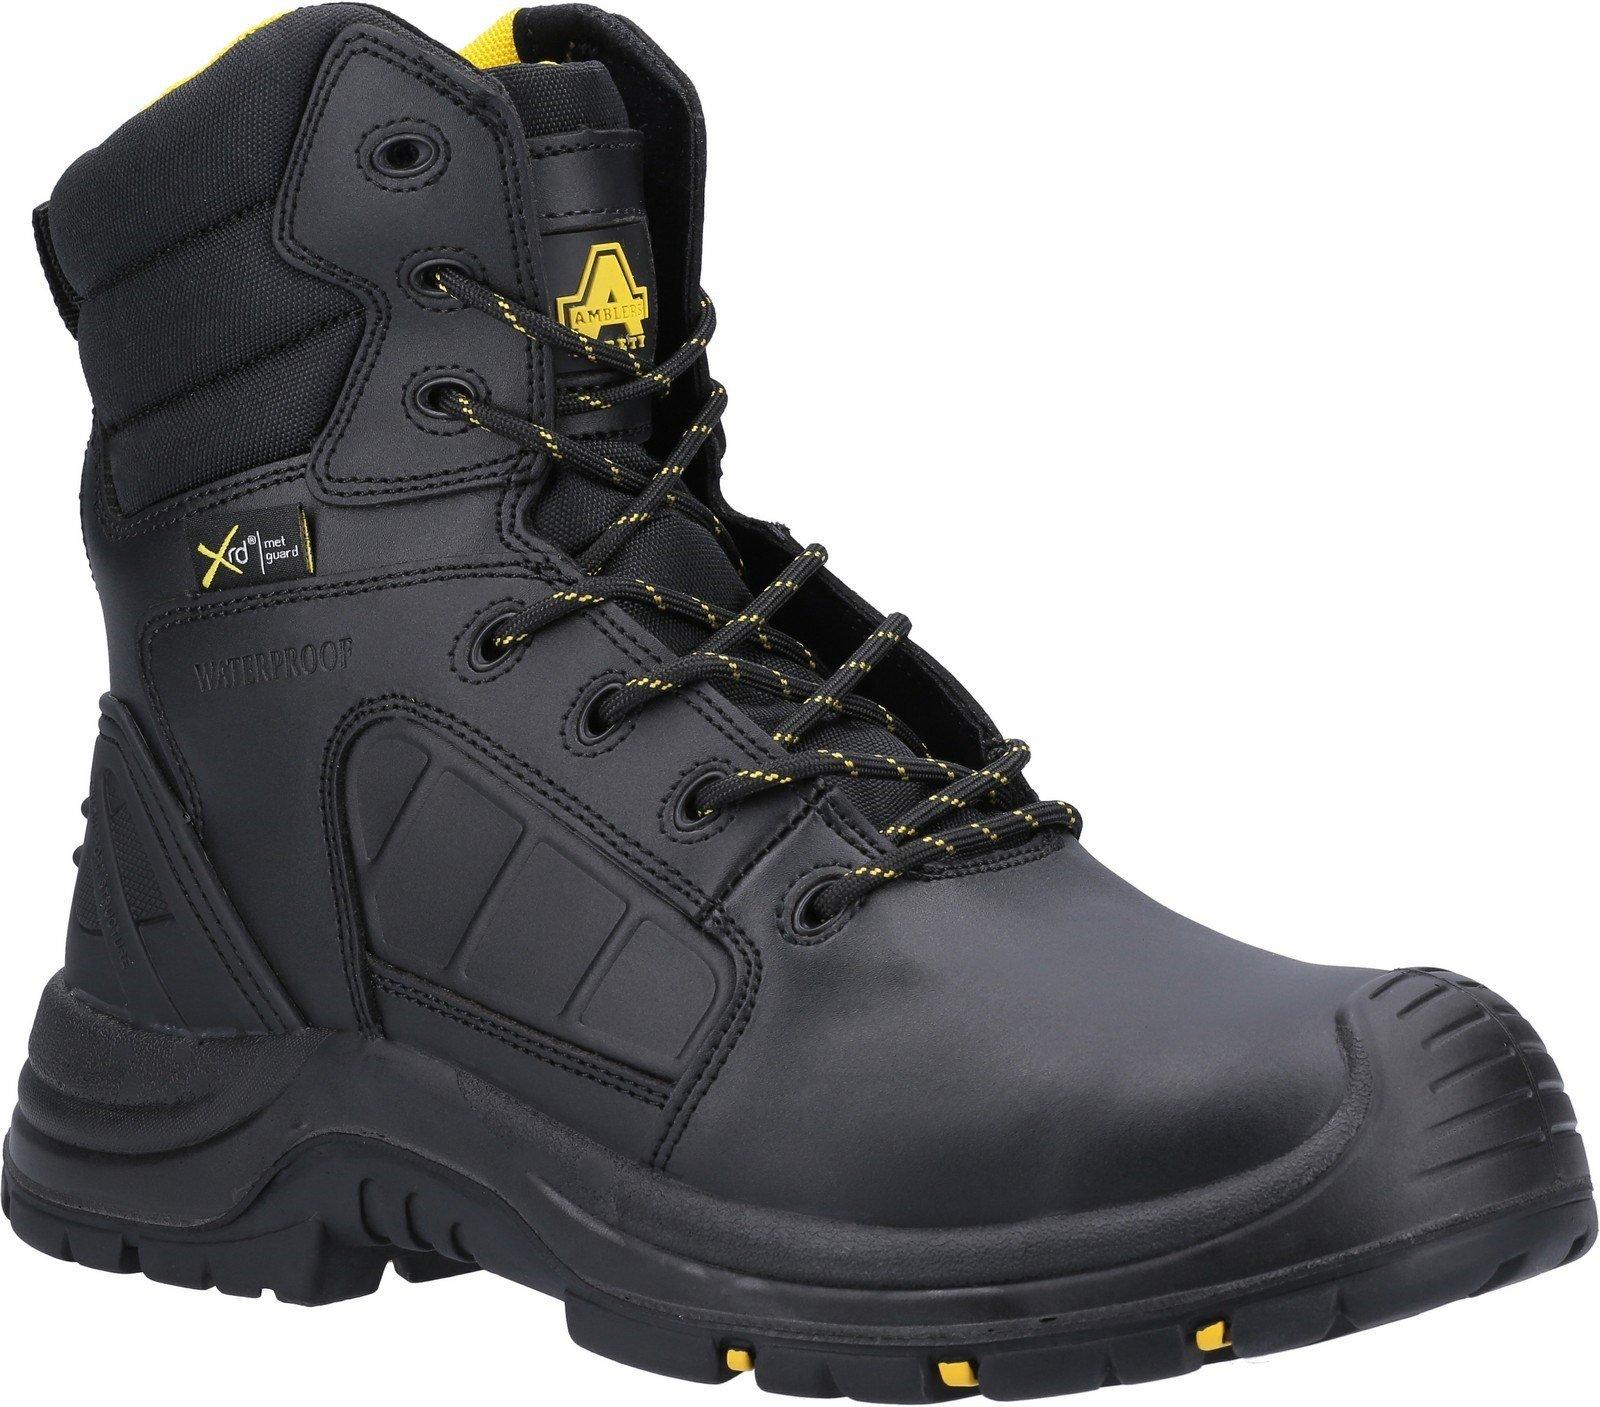 Amblers Safety Men's Berwyn Hi-Leg Waterproof Boot Black 29735 - Black 4